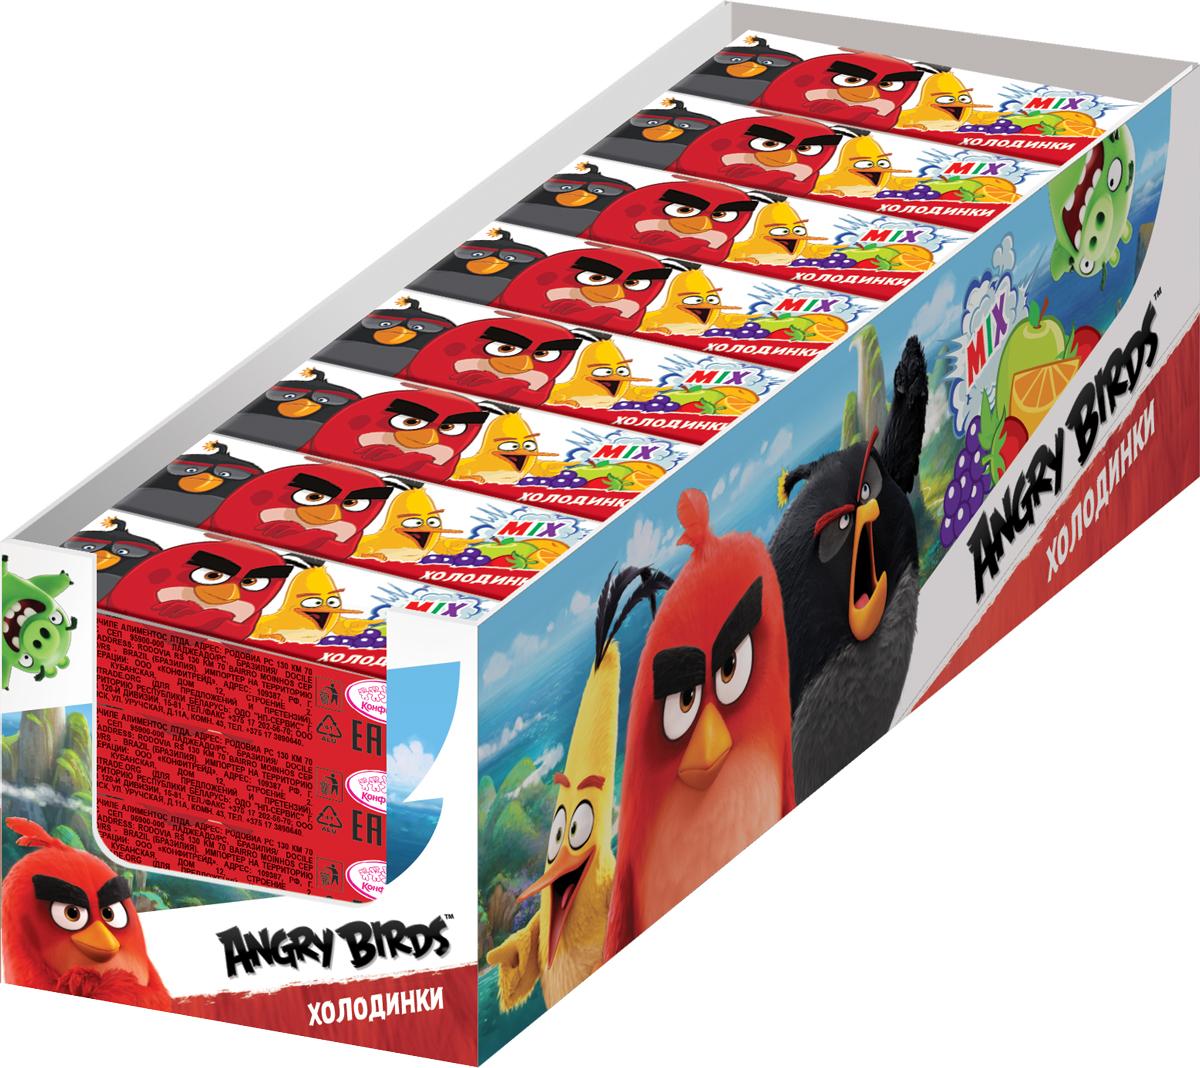 цена на Конфитрейд Angry Birds Movie драже холодинки, 40 шт по 17 г